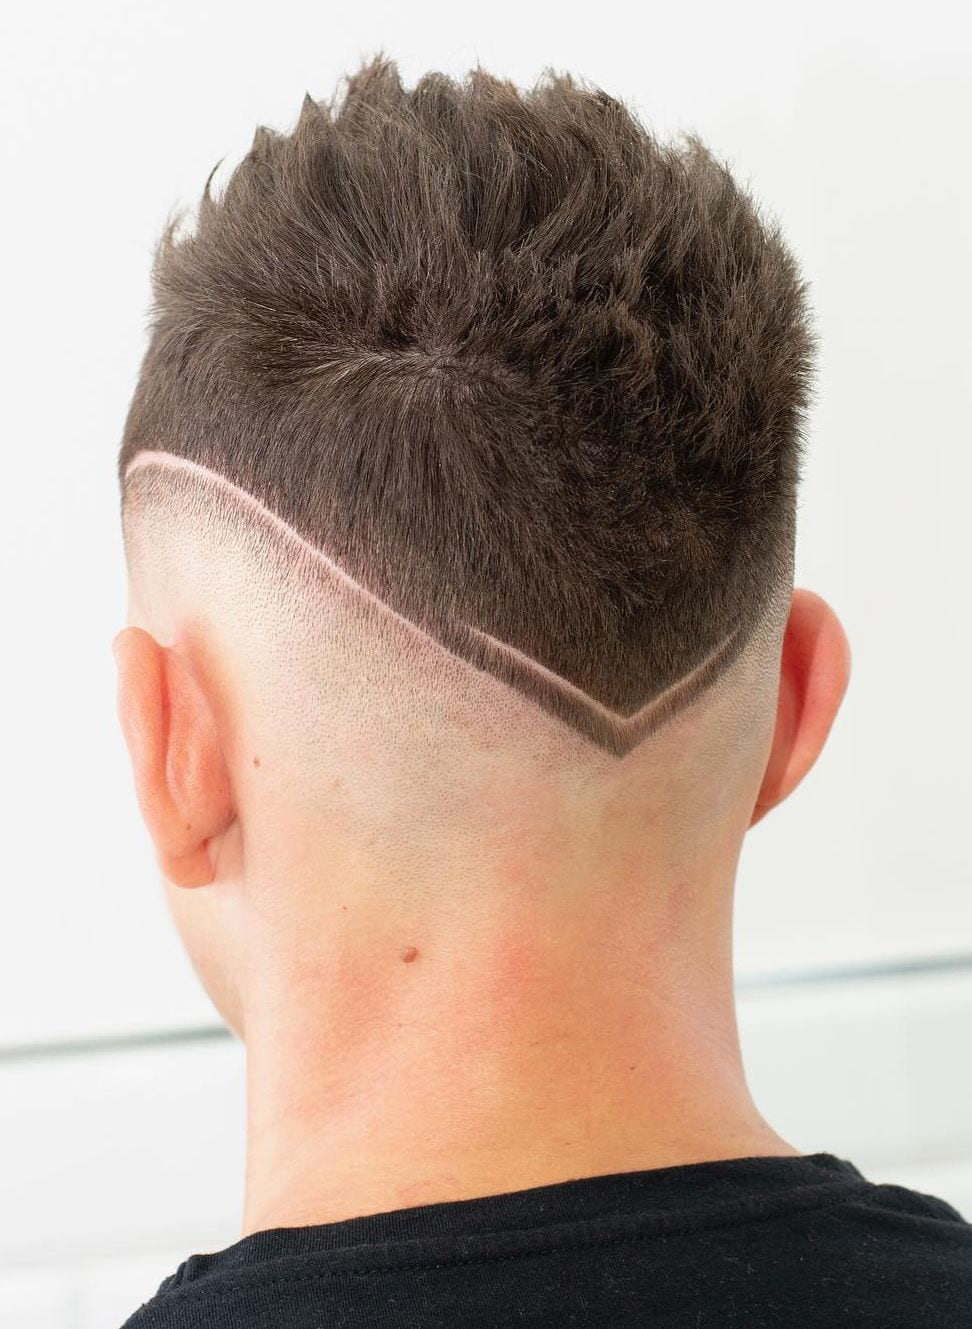 Thin Arrow Neckline Design